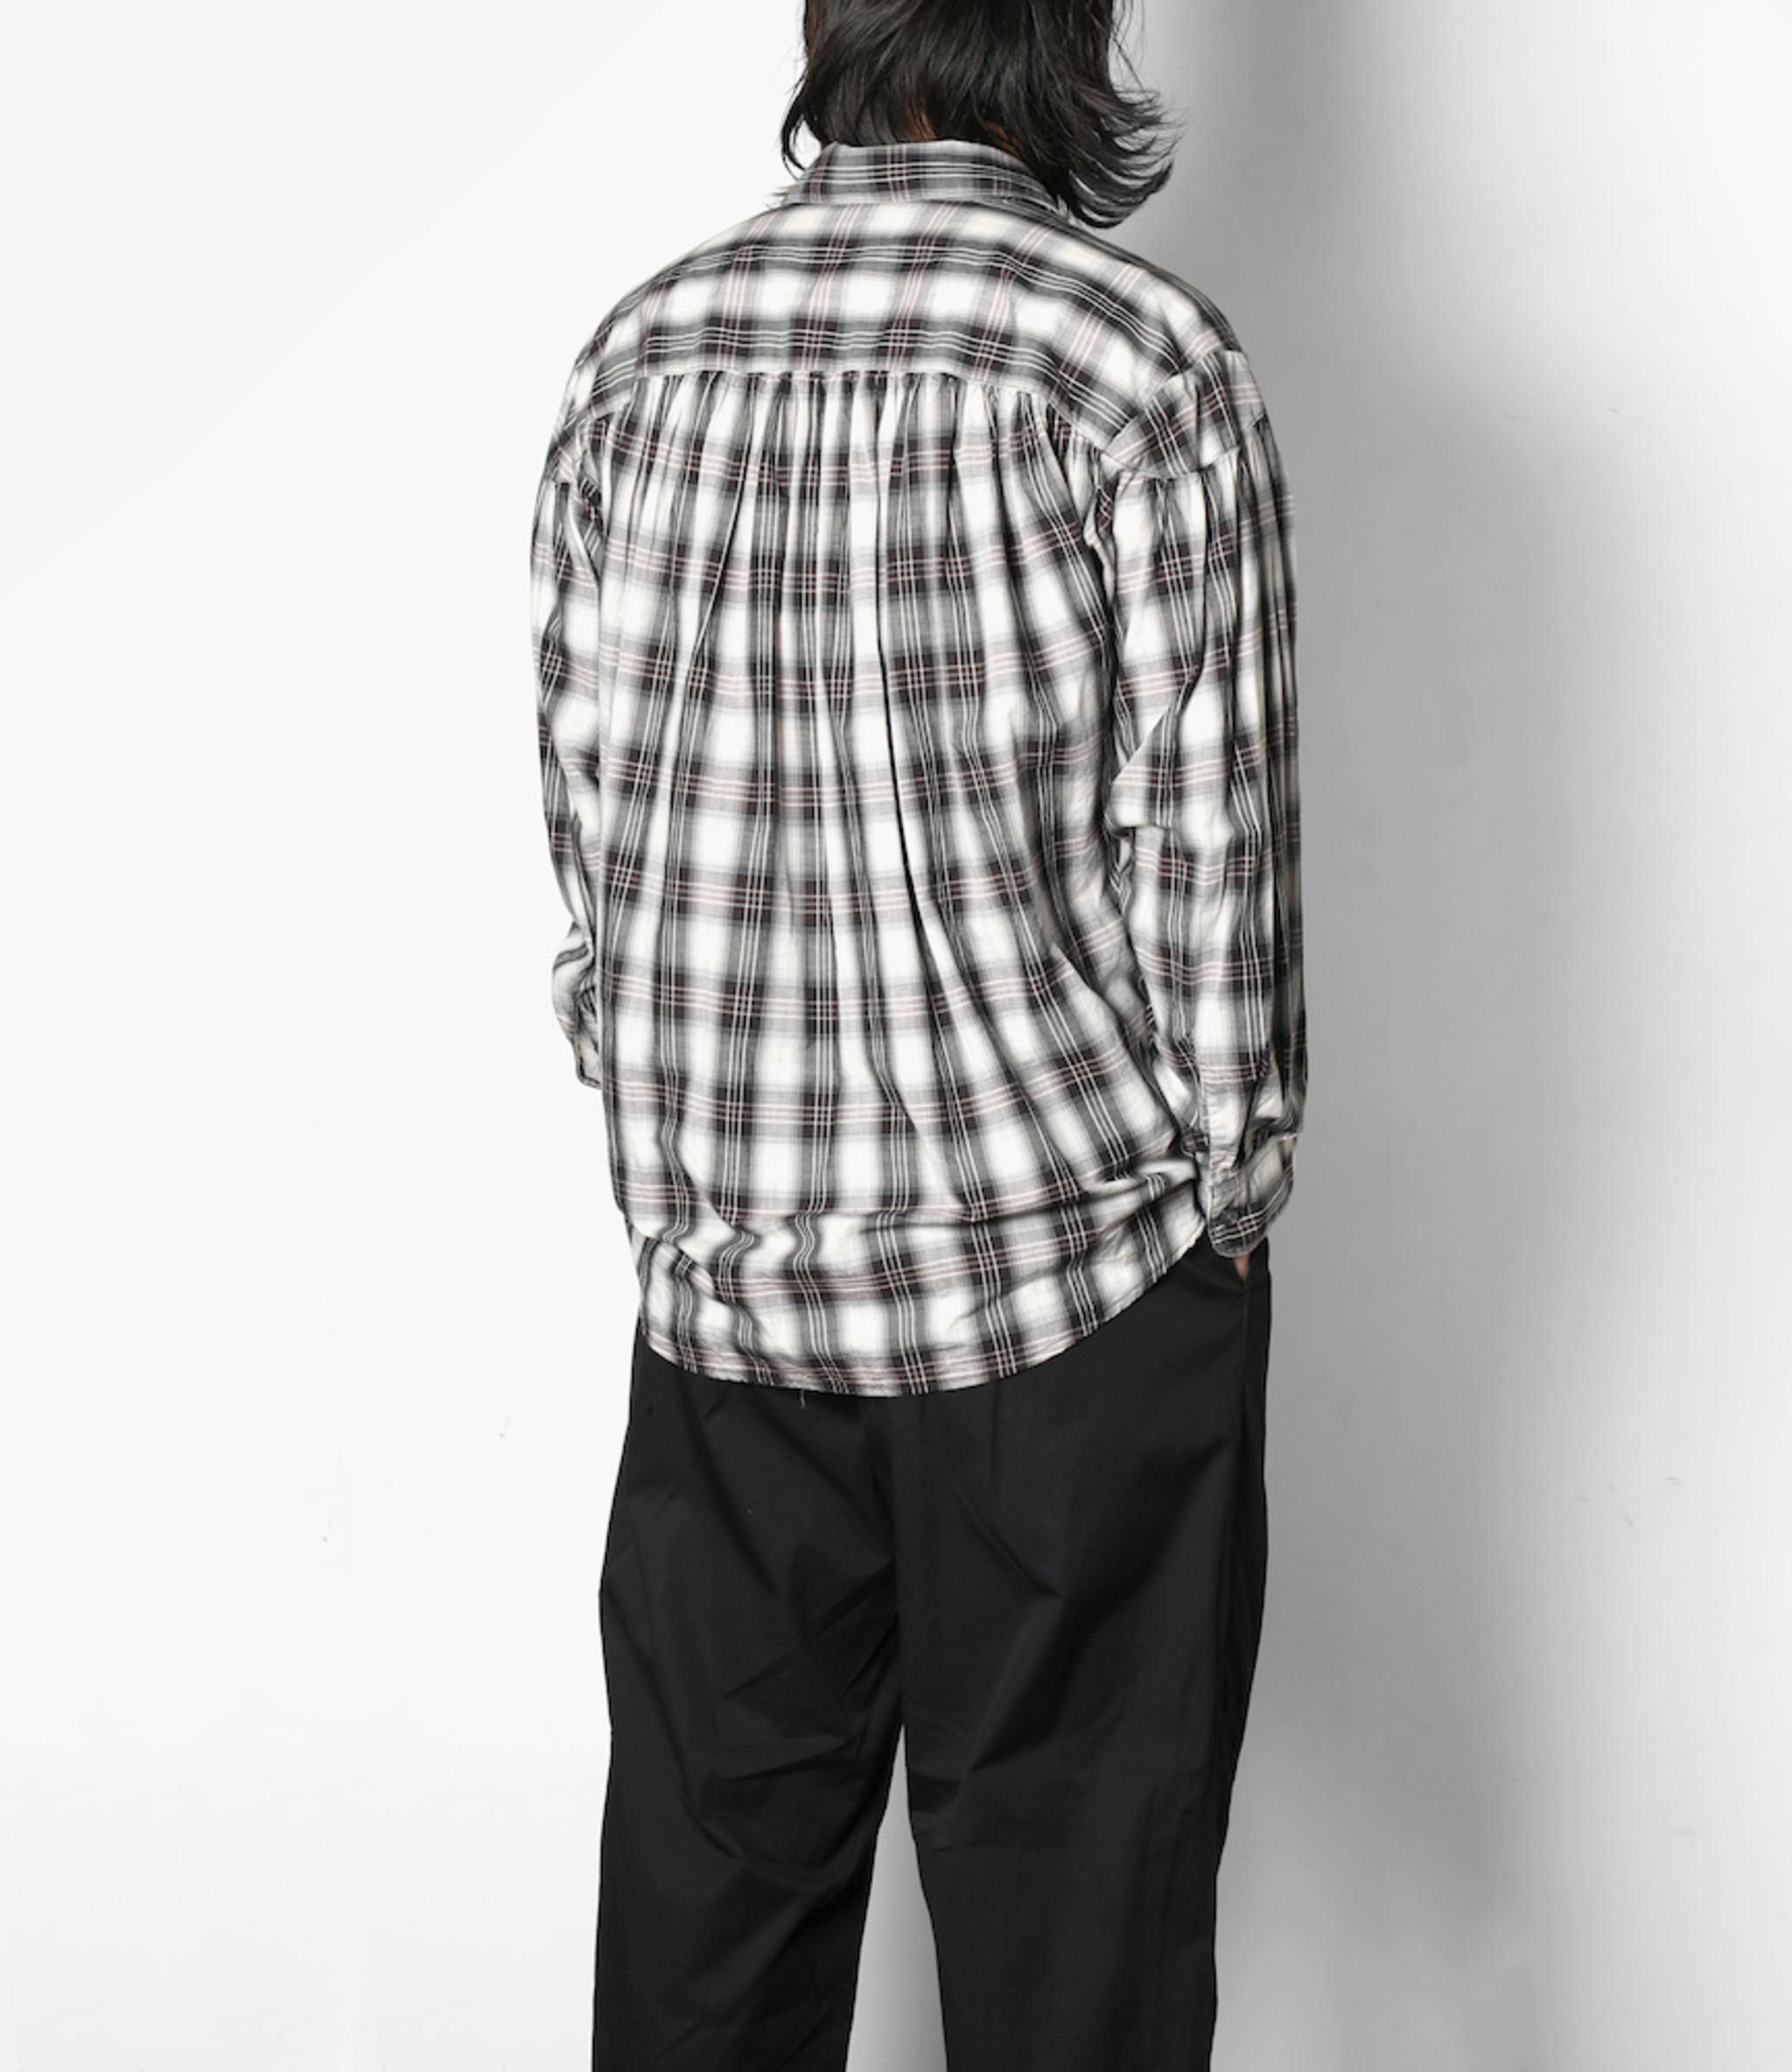 AïE Painter Shirt - Black White Purple Cotton Shadow Plaid